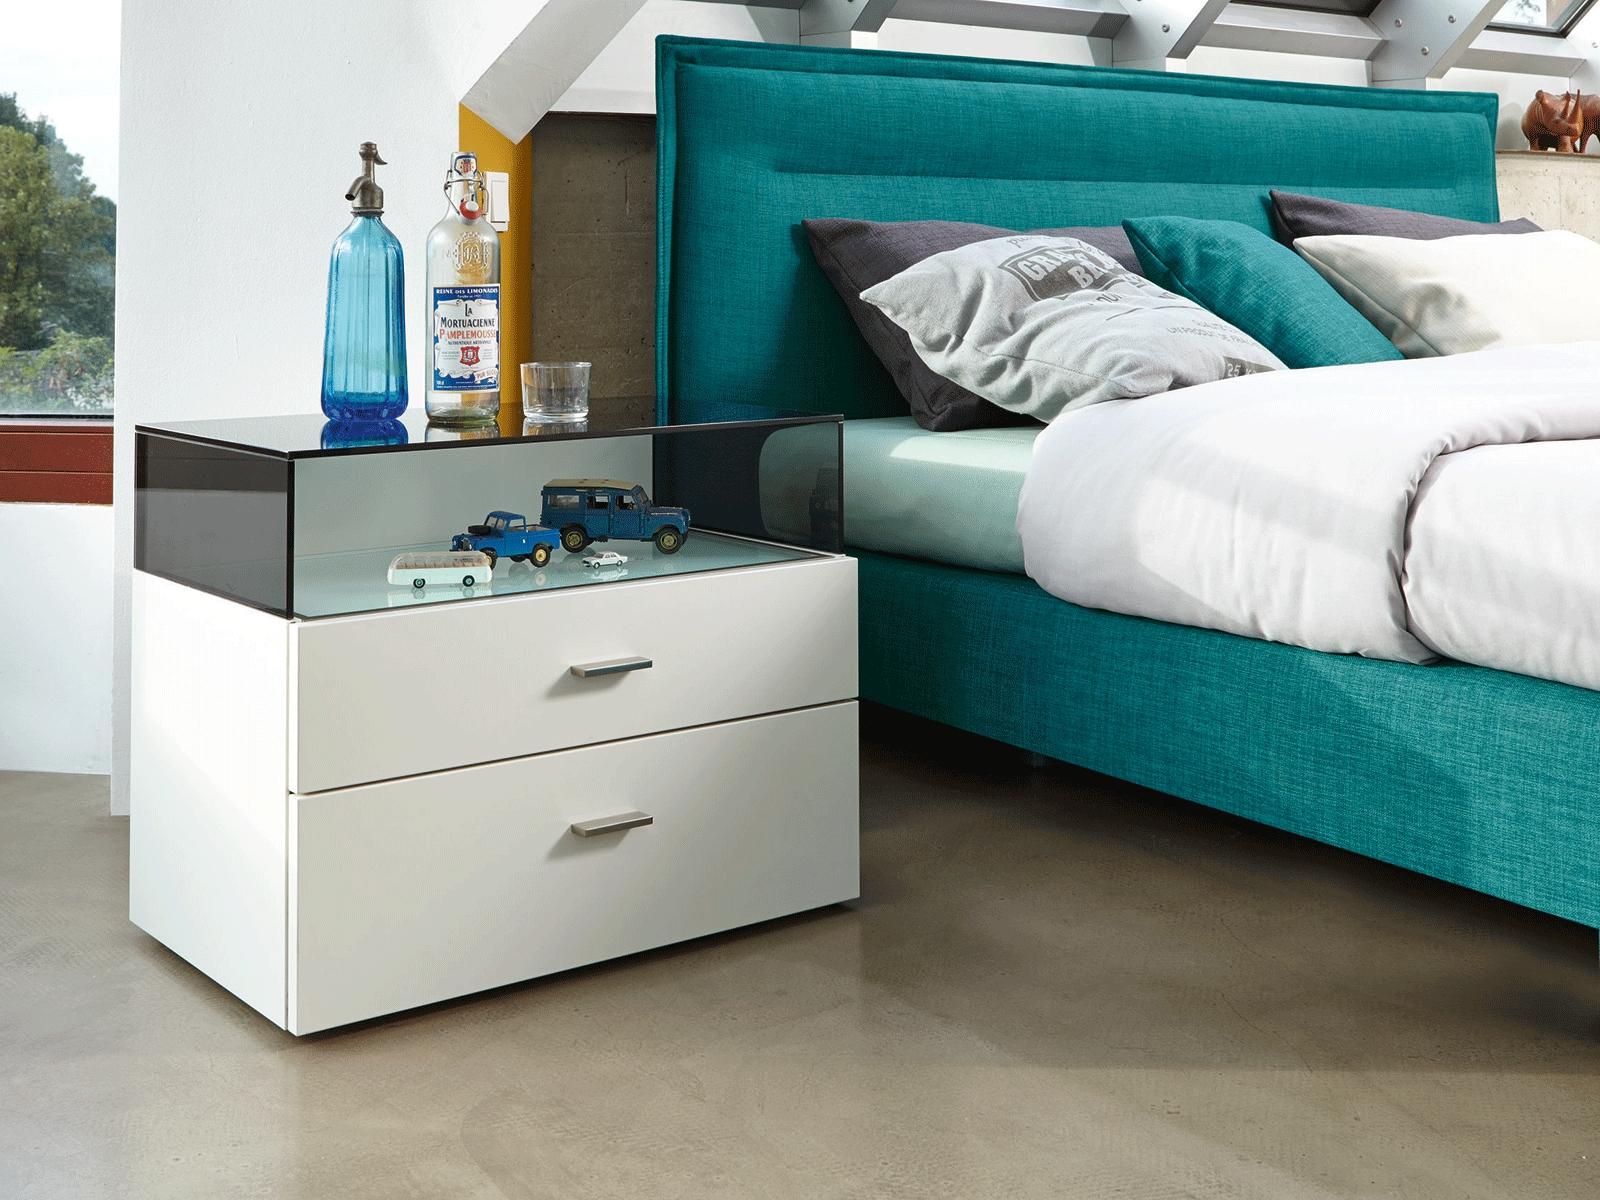 h lsta now boxspring c gy innoshop innoshop megfizethet design b torok s. Black Bedroom Furniture Sets. Home Design Ideas